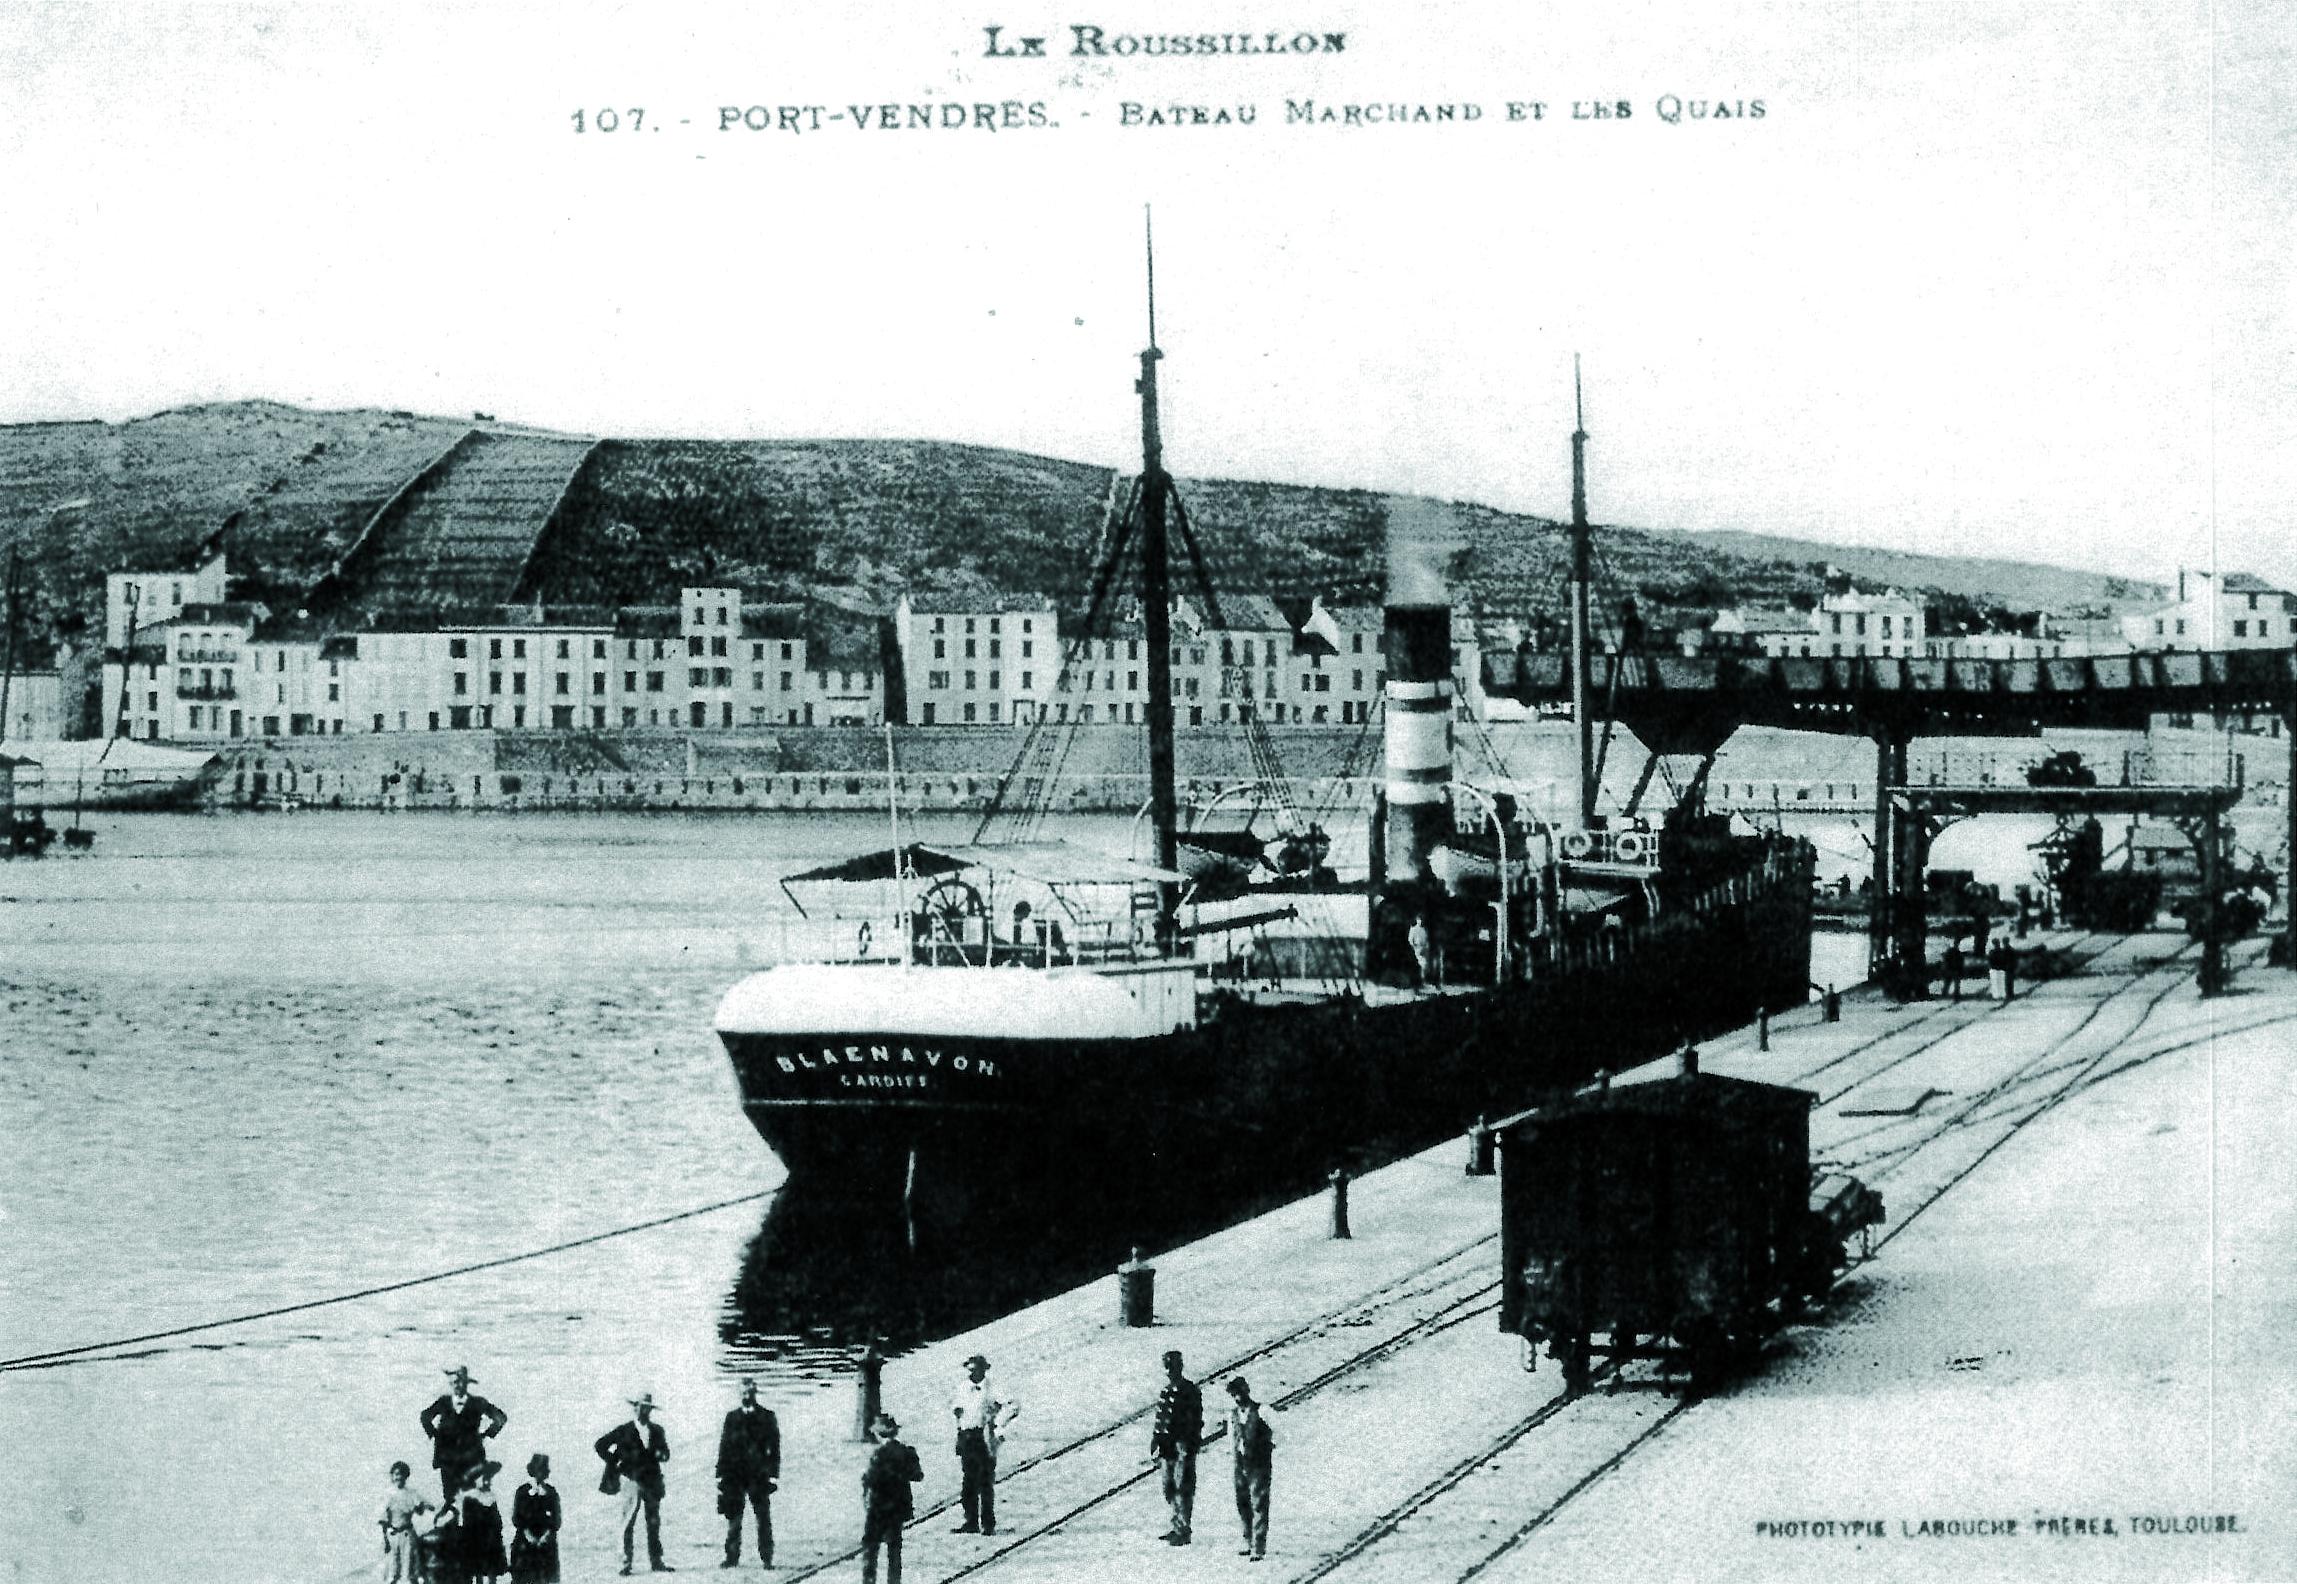 bateau marchand 1900